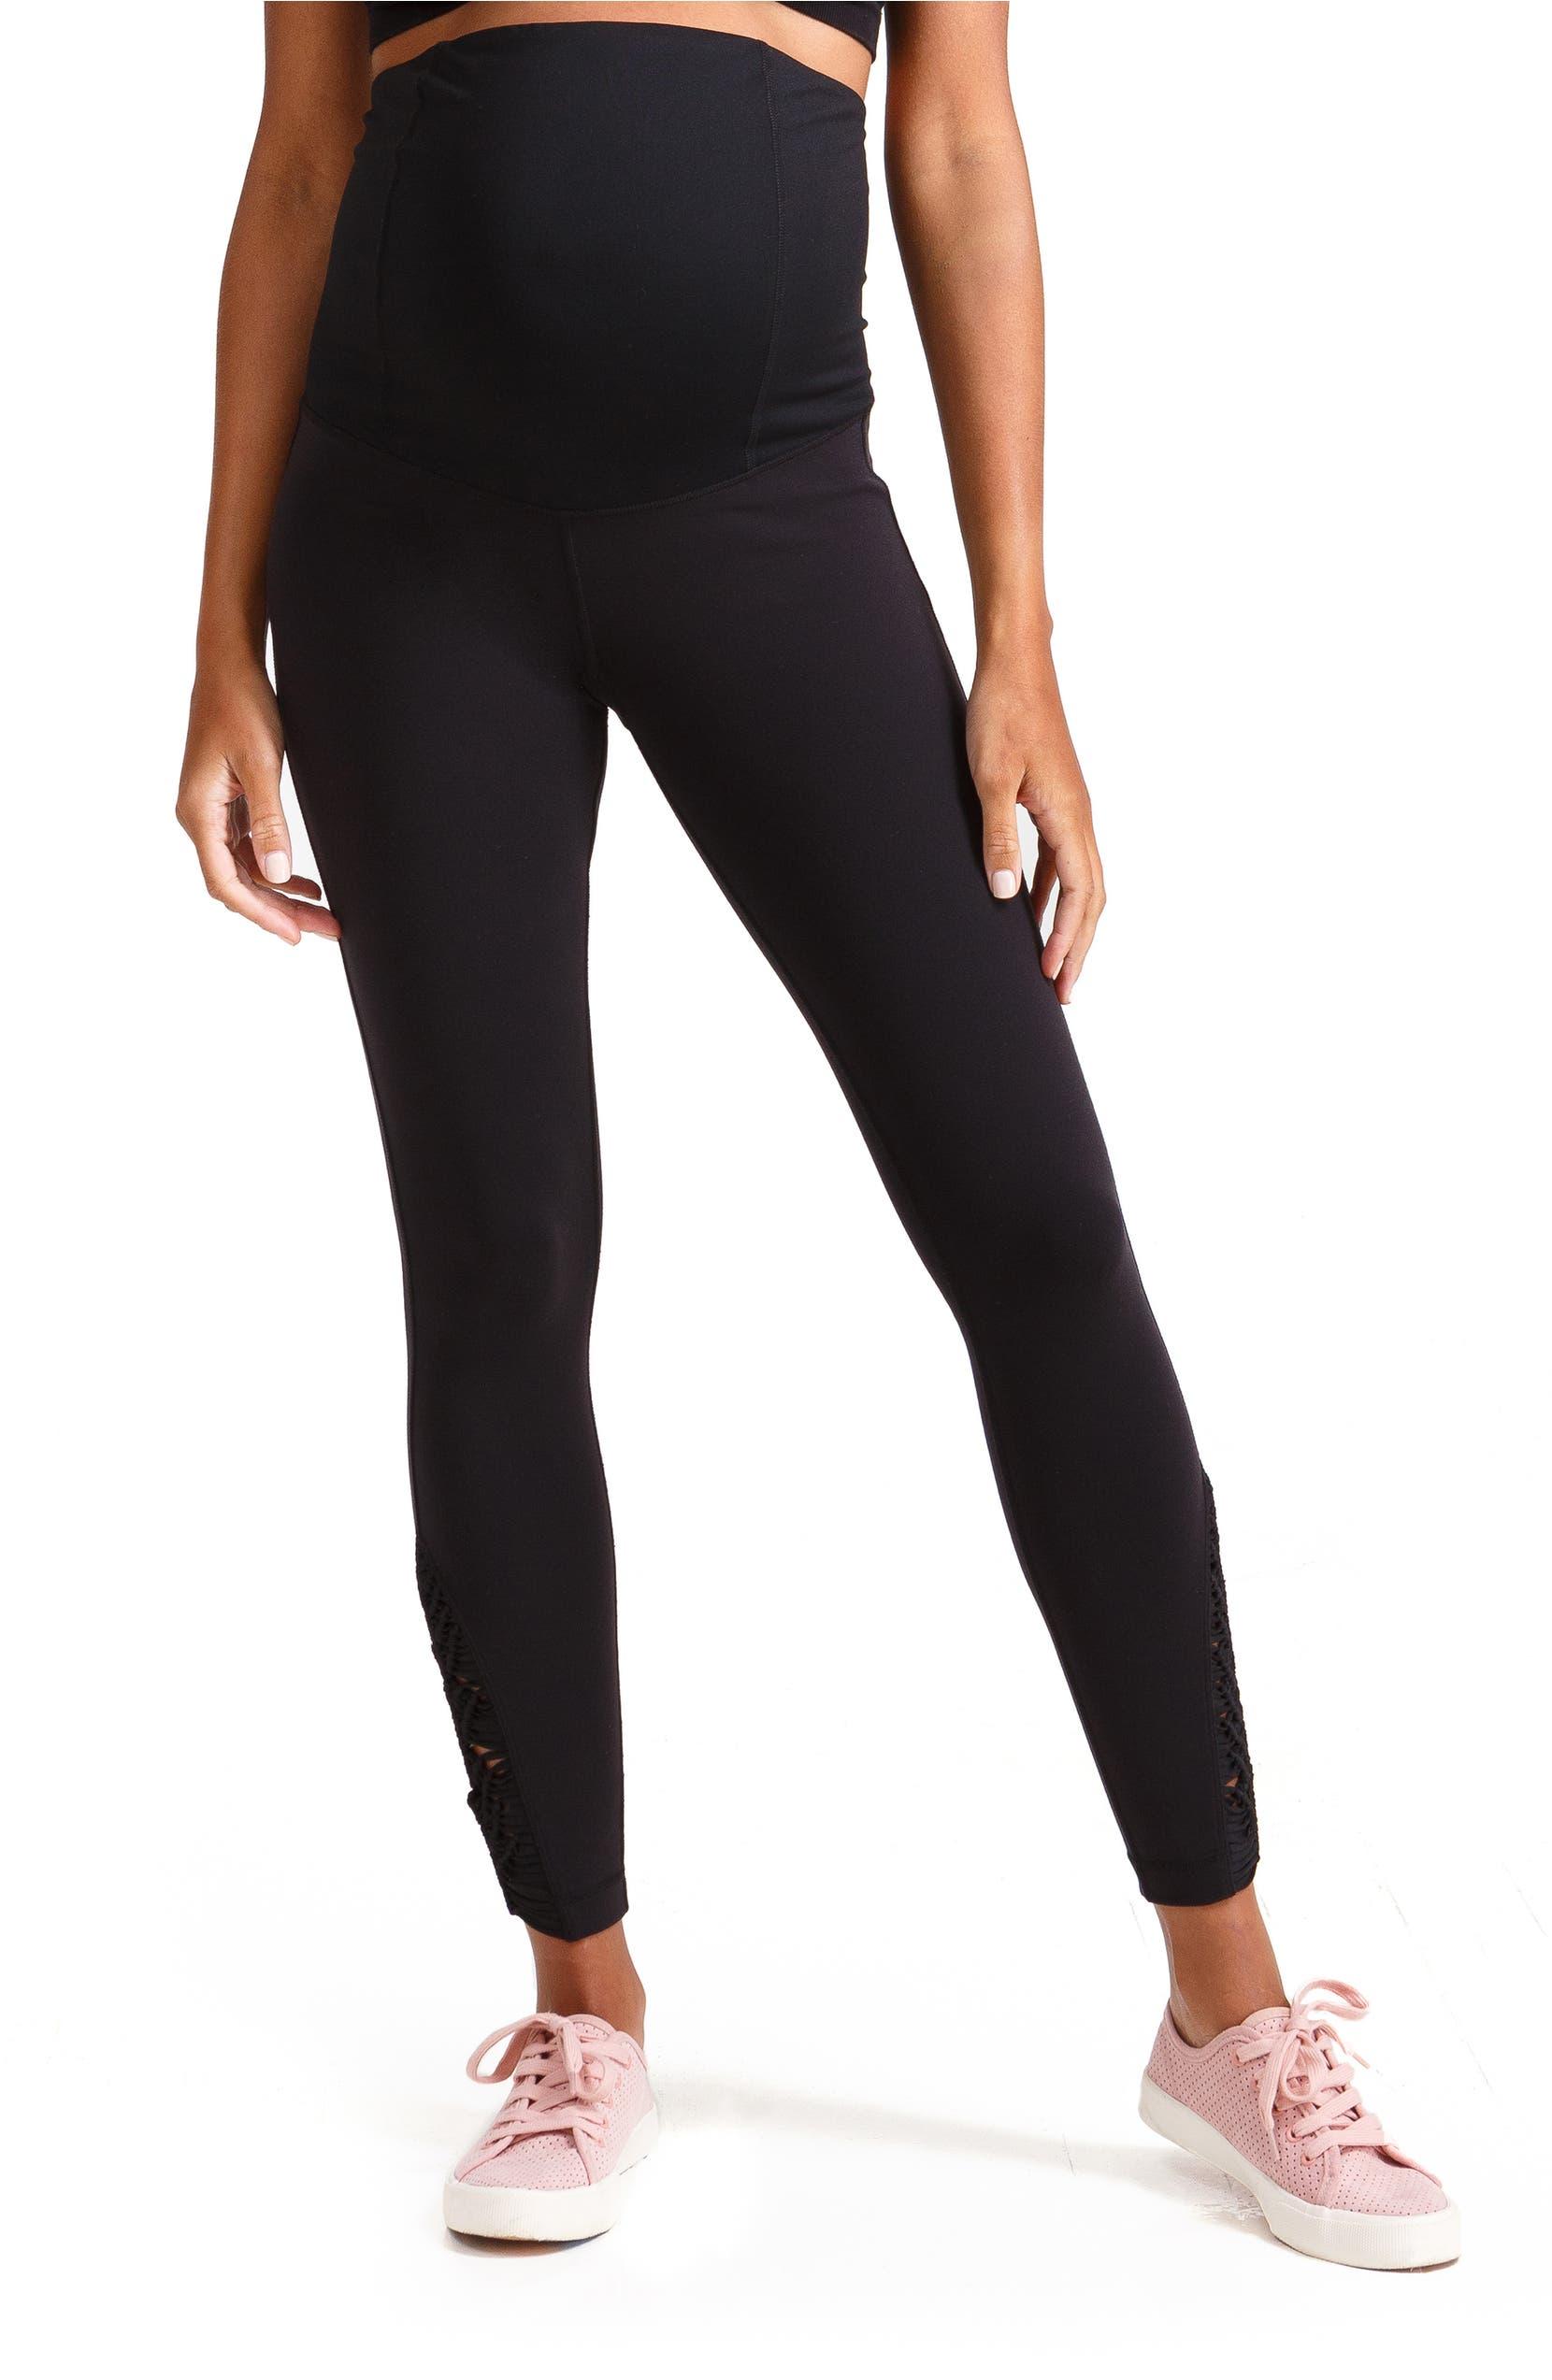 90f4c786c530d Ingrid & Isabel® Active Maternity Leggings with Macramé Detail | Nordstrom